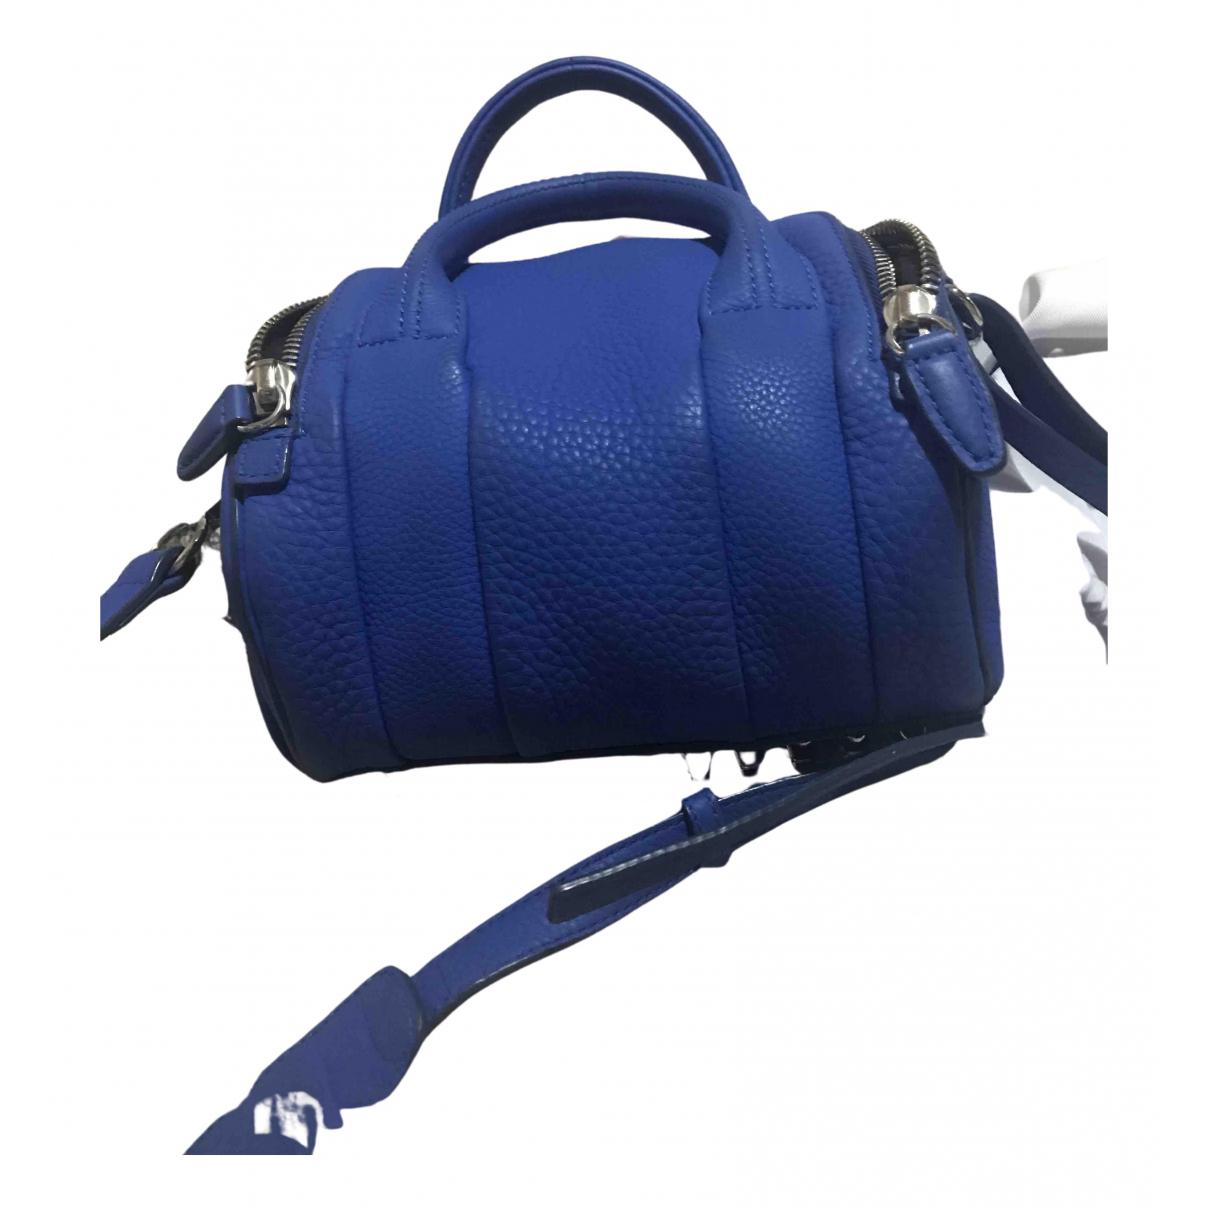 Alexander Wang Rockie Leather handbag for Women N